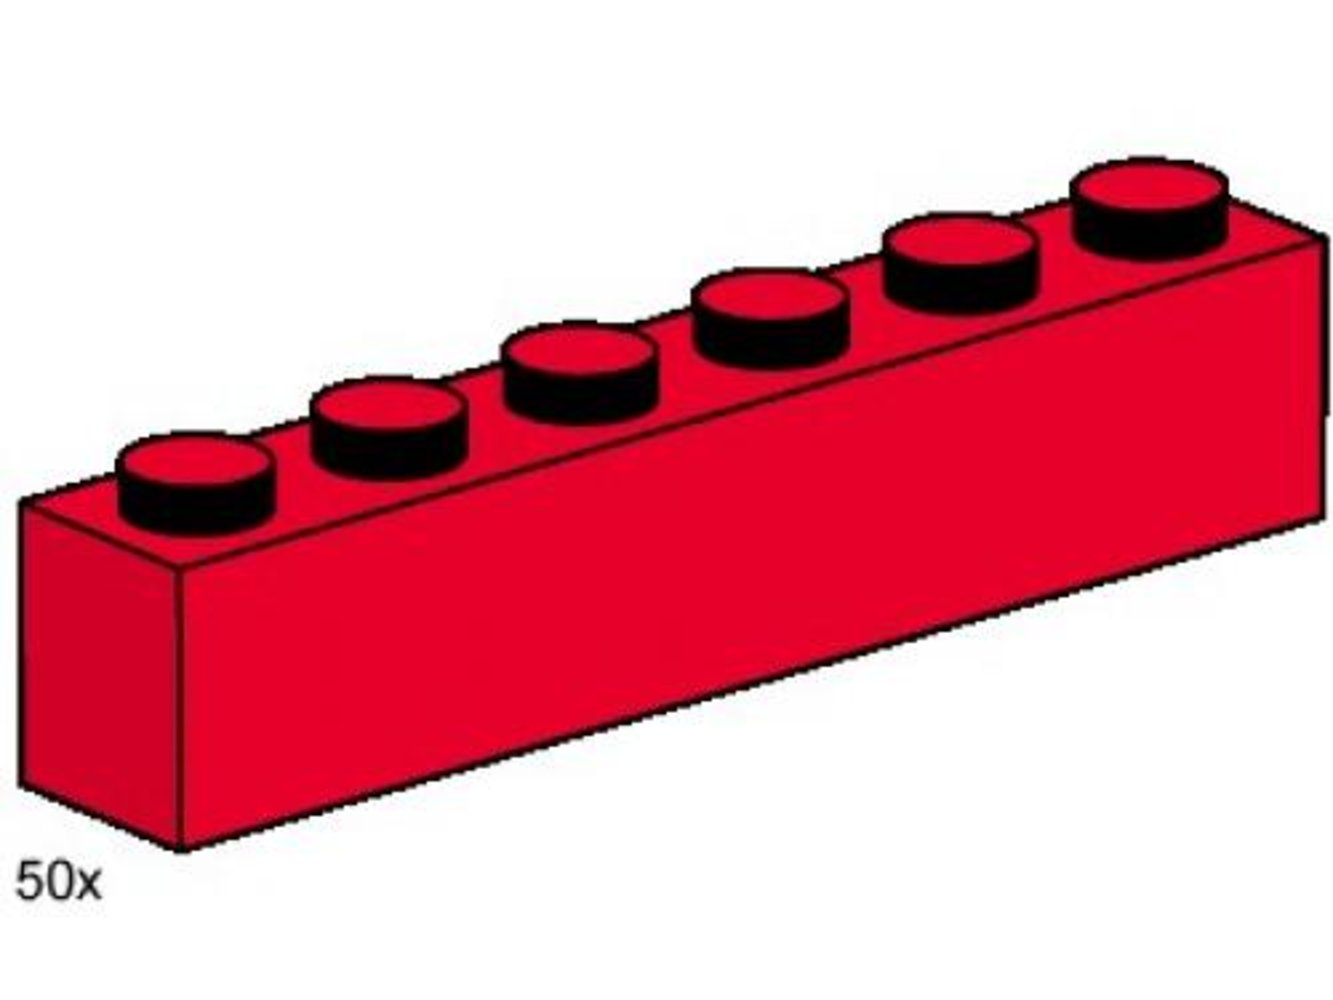 1 x 6 Red Bricks